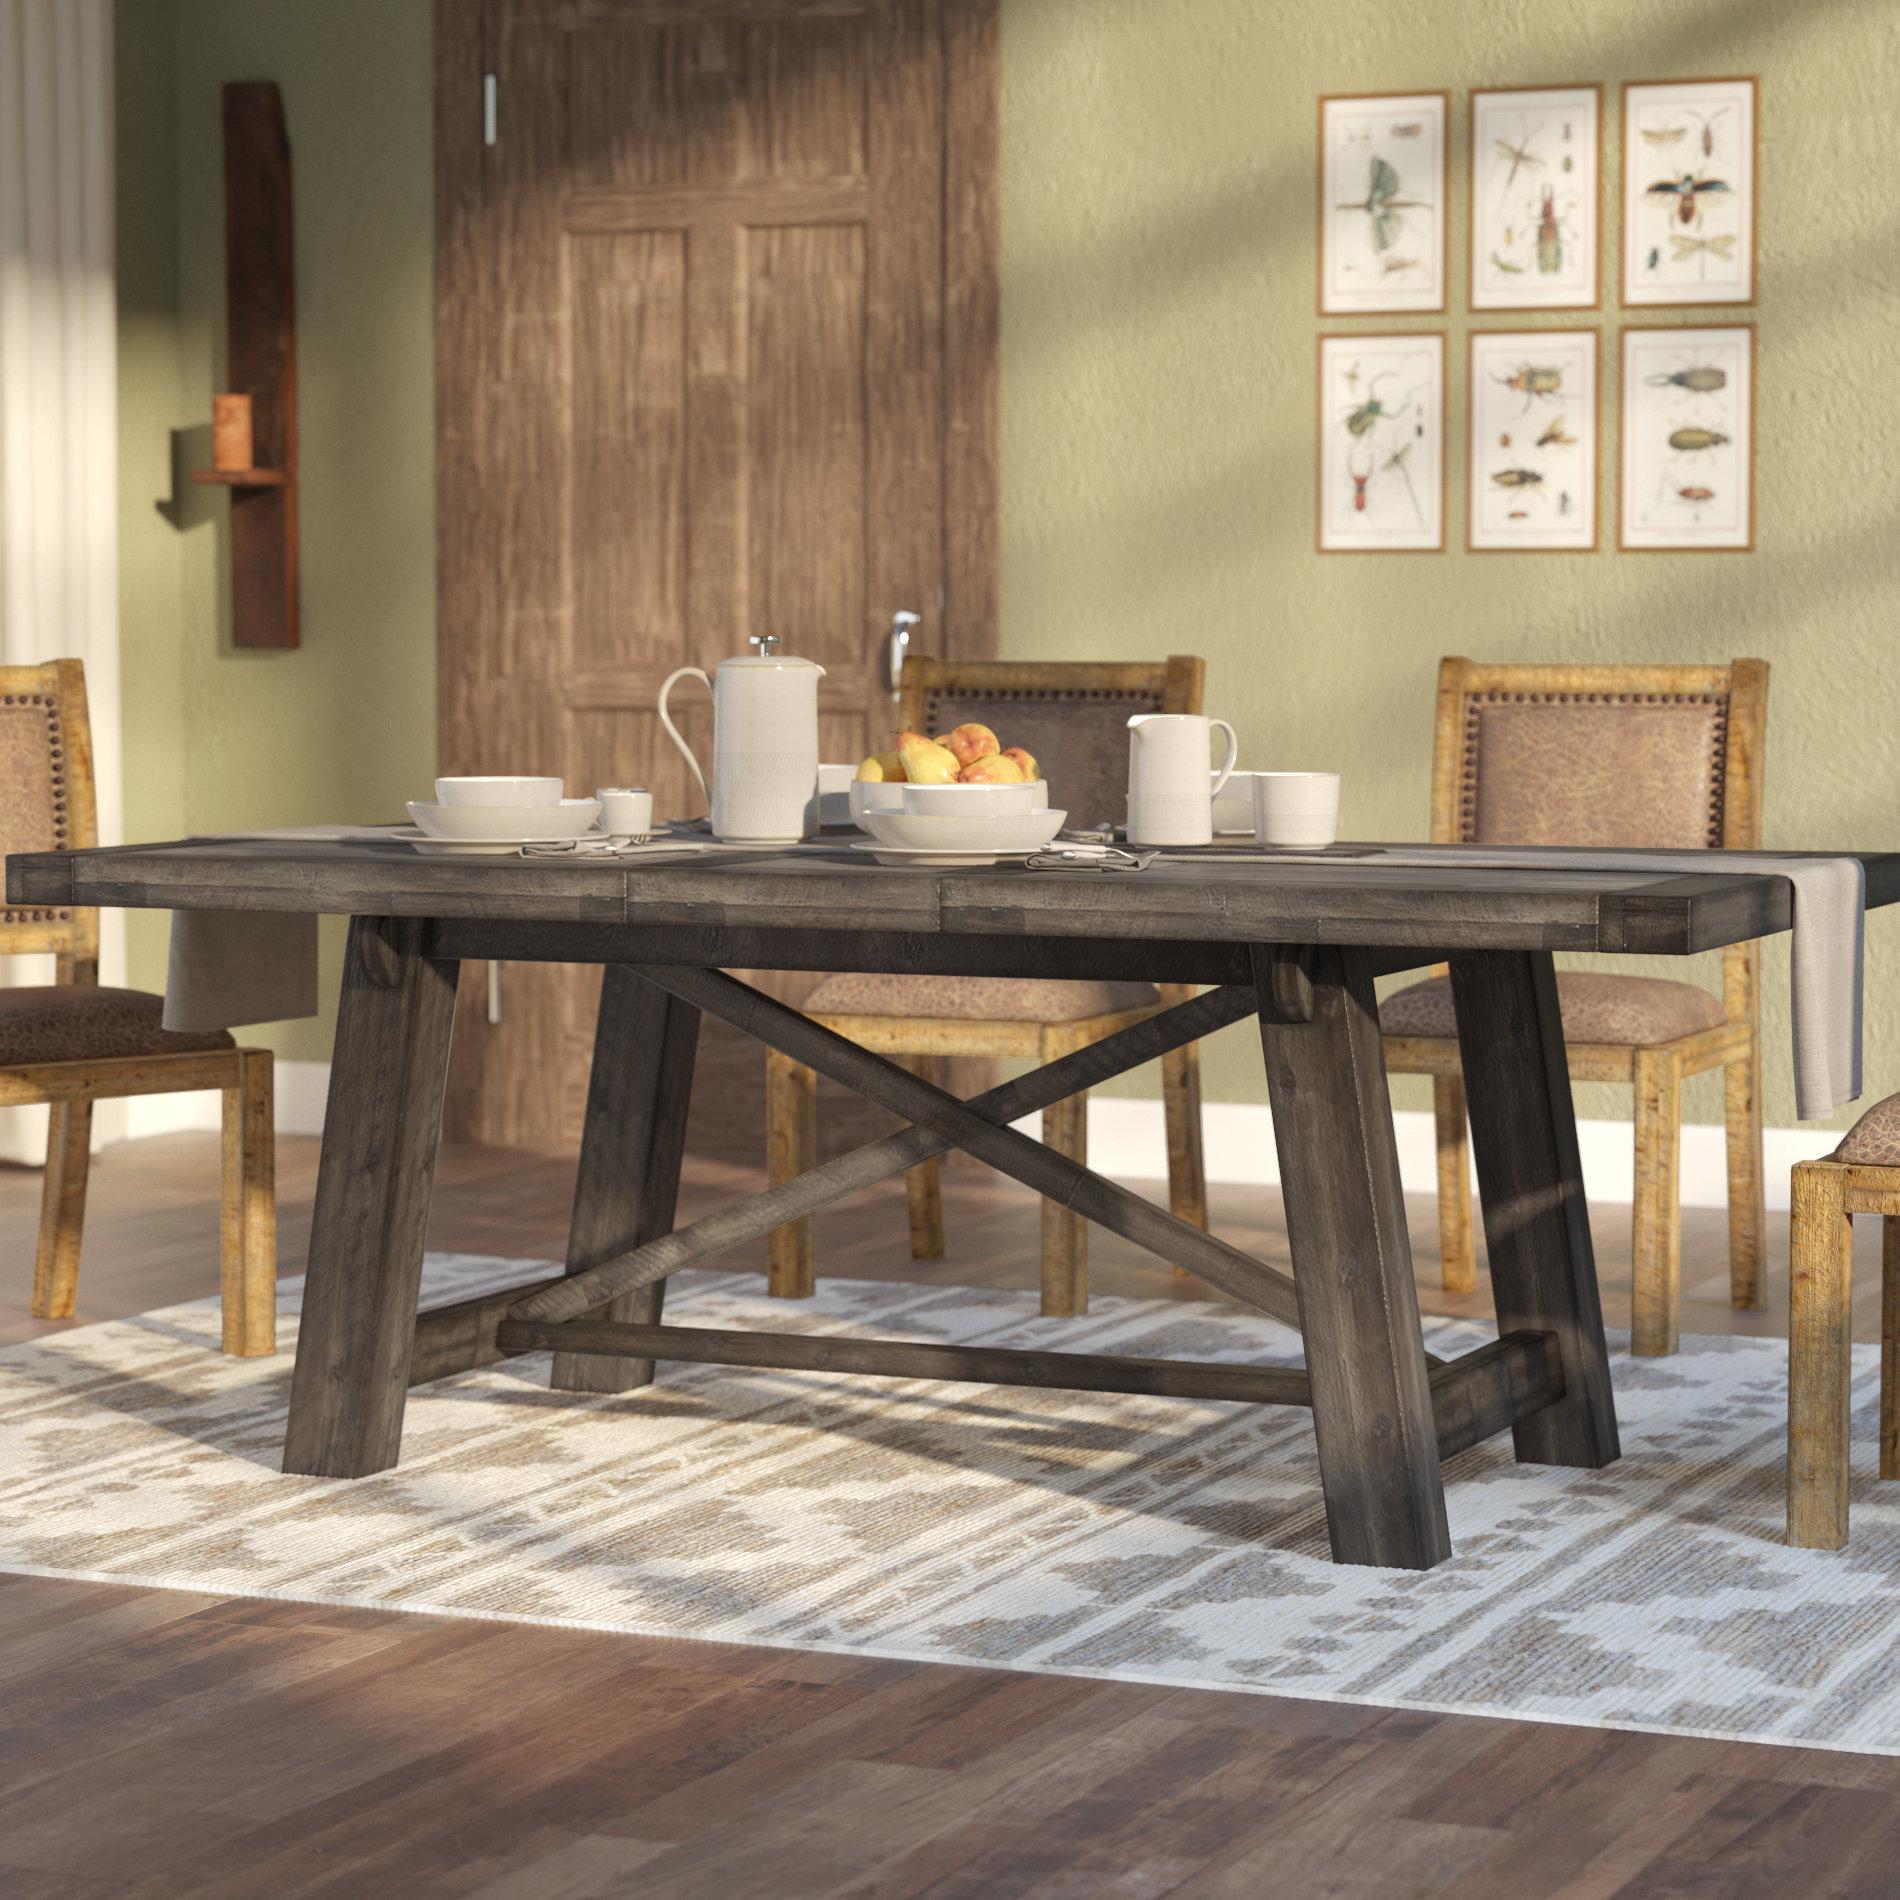 Laurel Foundry Modern Farmhouse Colborne Extendable Solid Wood Dining Table  & Reviews | Wayfair